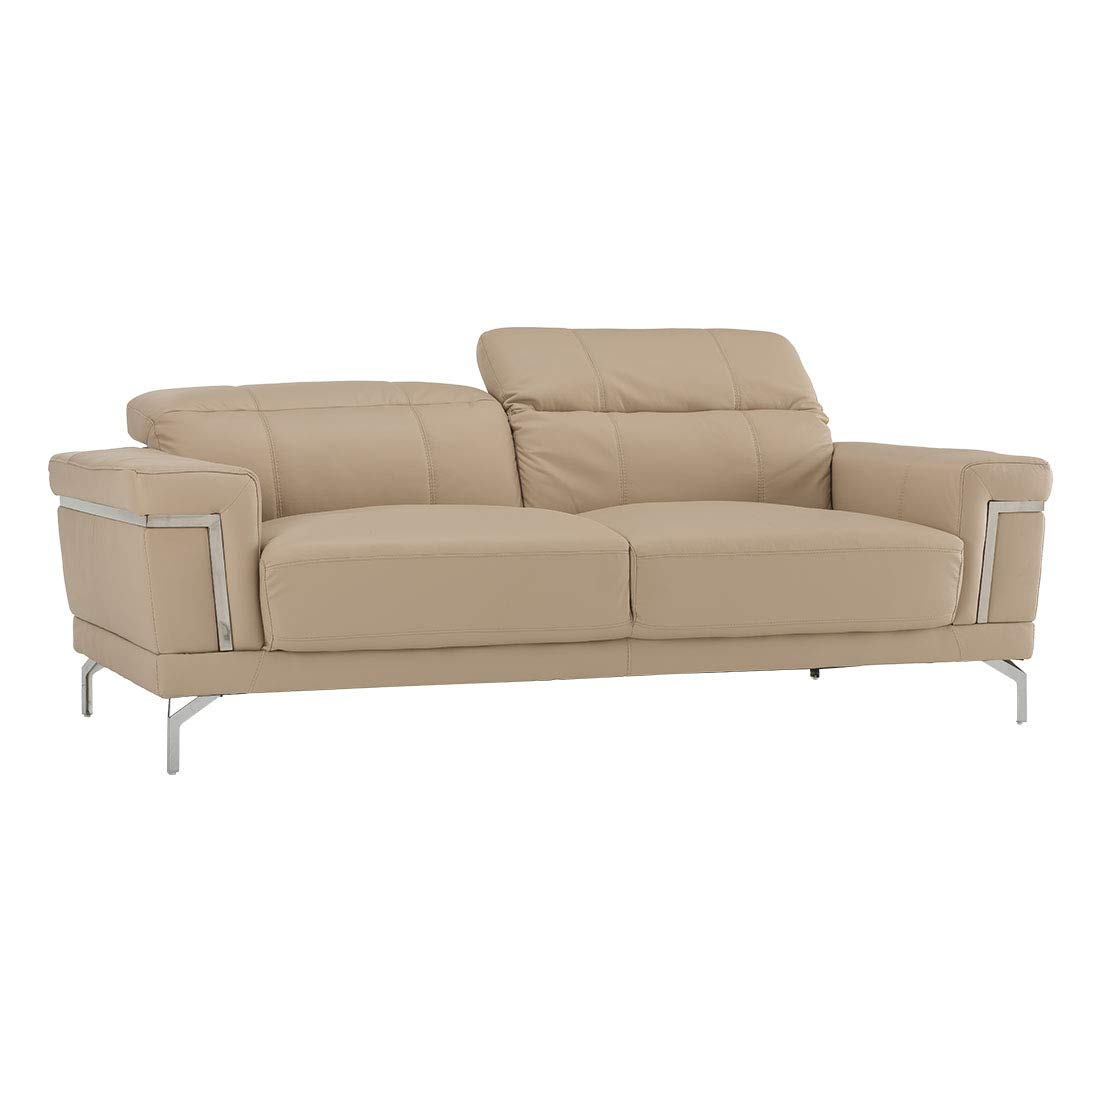 Terrific Durian Marcus Three Seater Sectional Sofa Beige Amazon In Evergreenethics Interior Chair Design Evergreenethicsorg